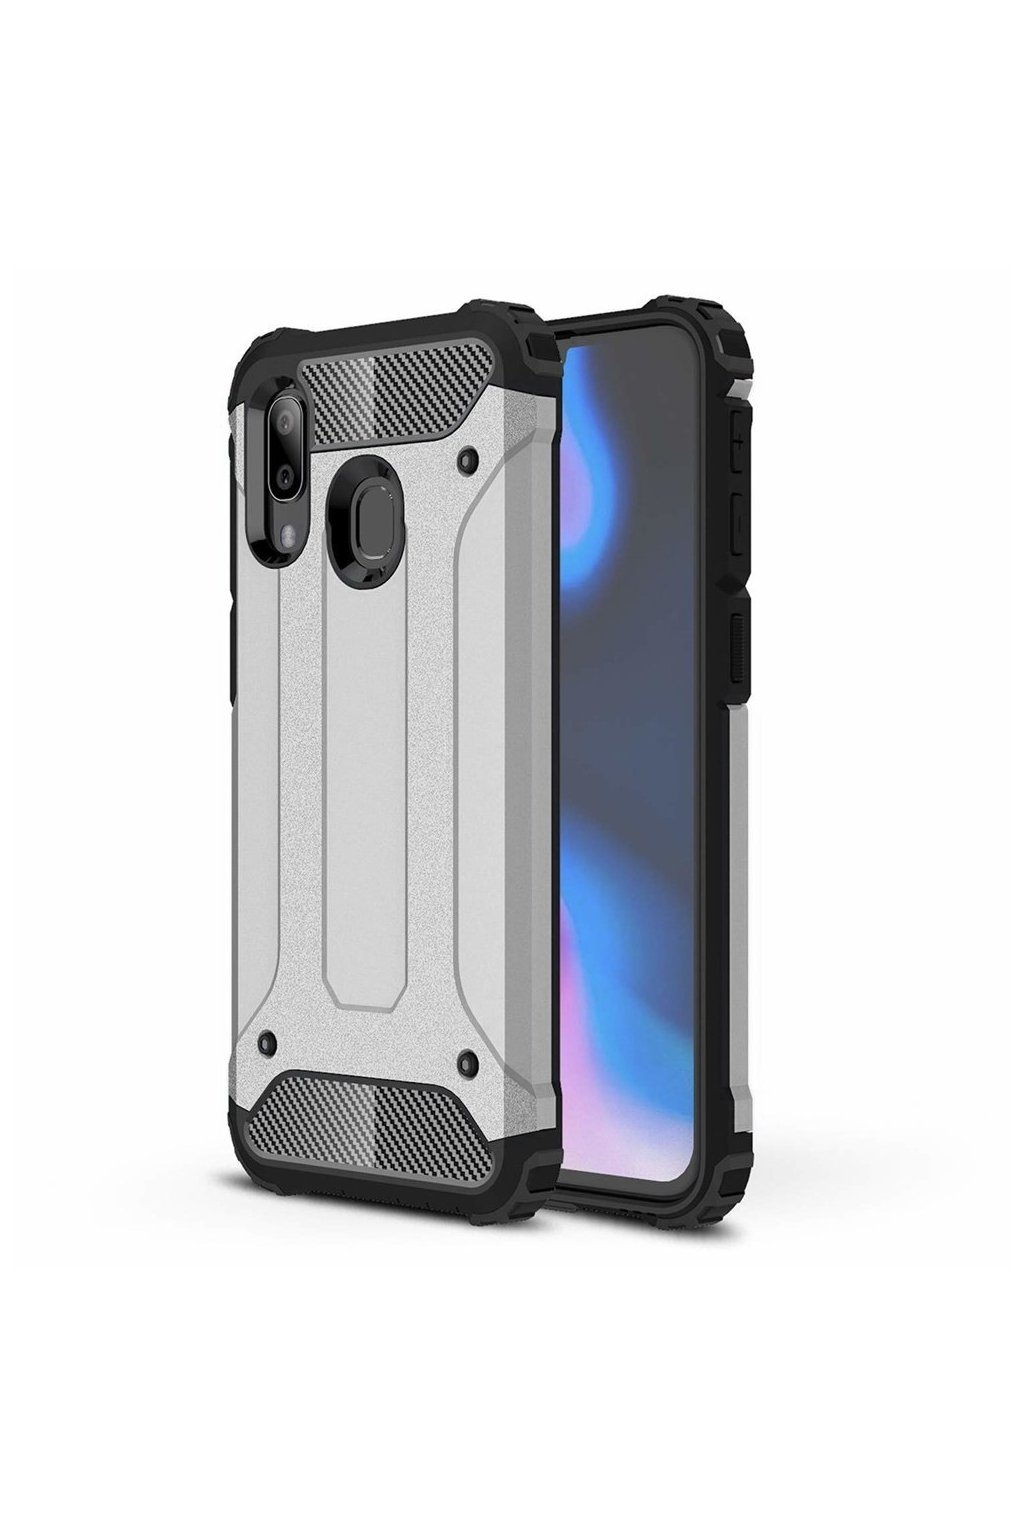 eng pl Hybrid Armor Case Tough Rugged Cover for Samsung Galaxy A40 silver 50376 6